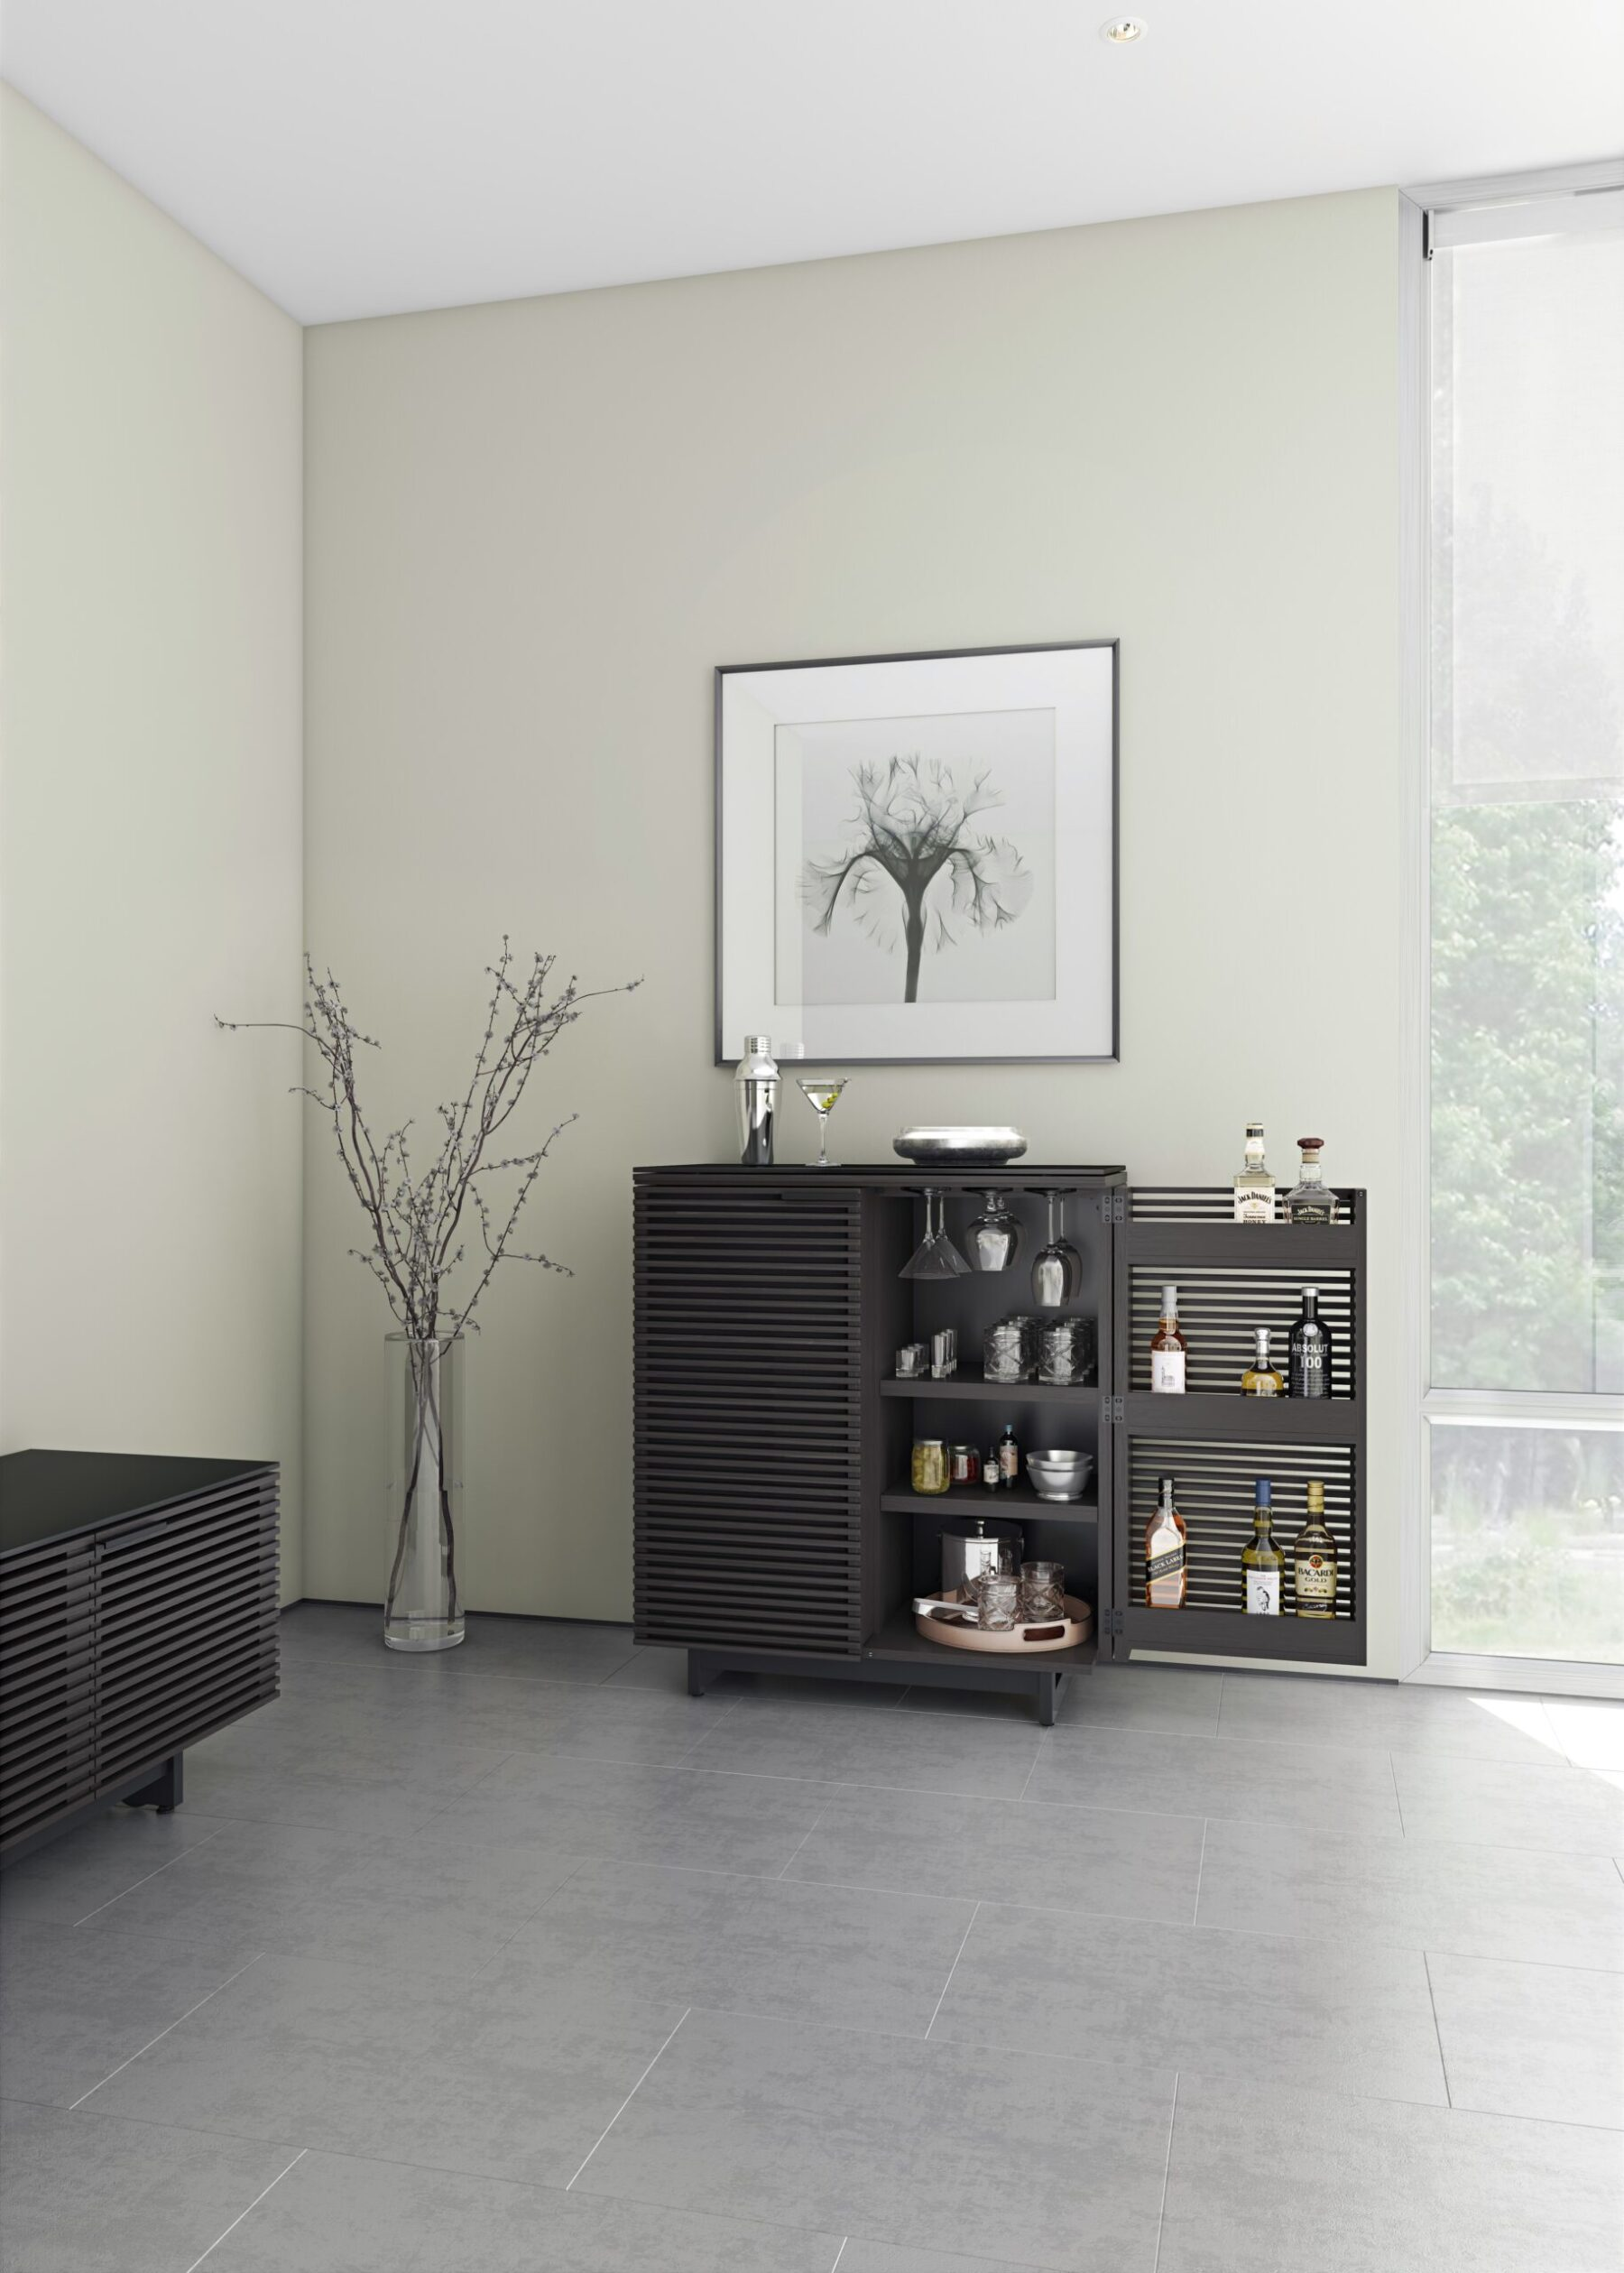 corridor-bar-5620-home-bar-charcoal-BDI-5